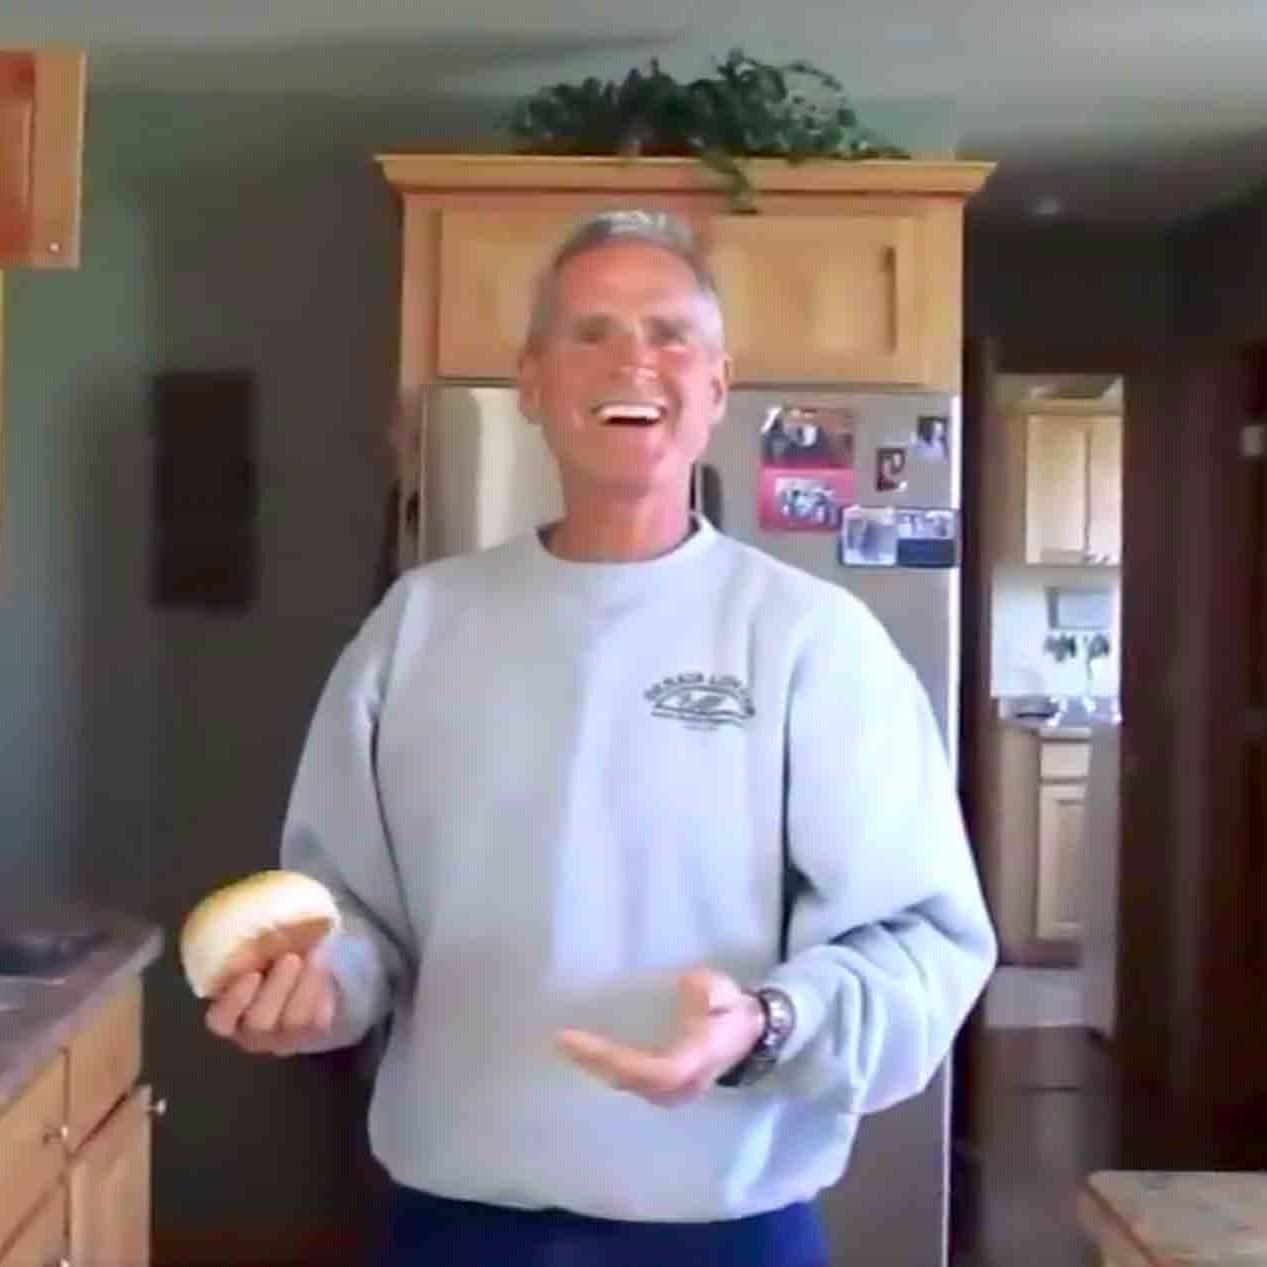 Bun in the Oven Pregnancy Announcement – Bun in the Oven Baby Announcement